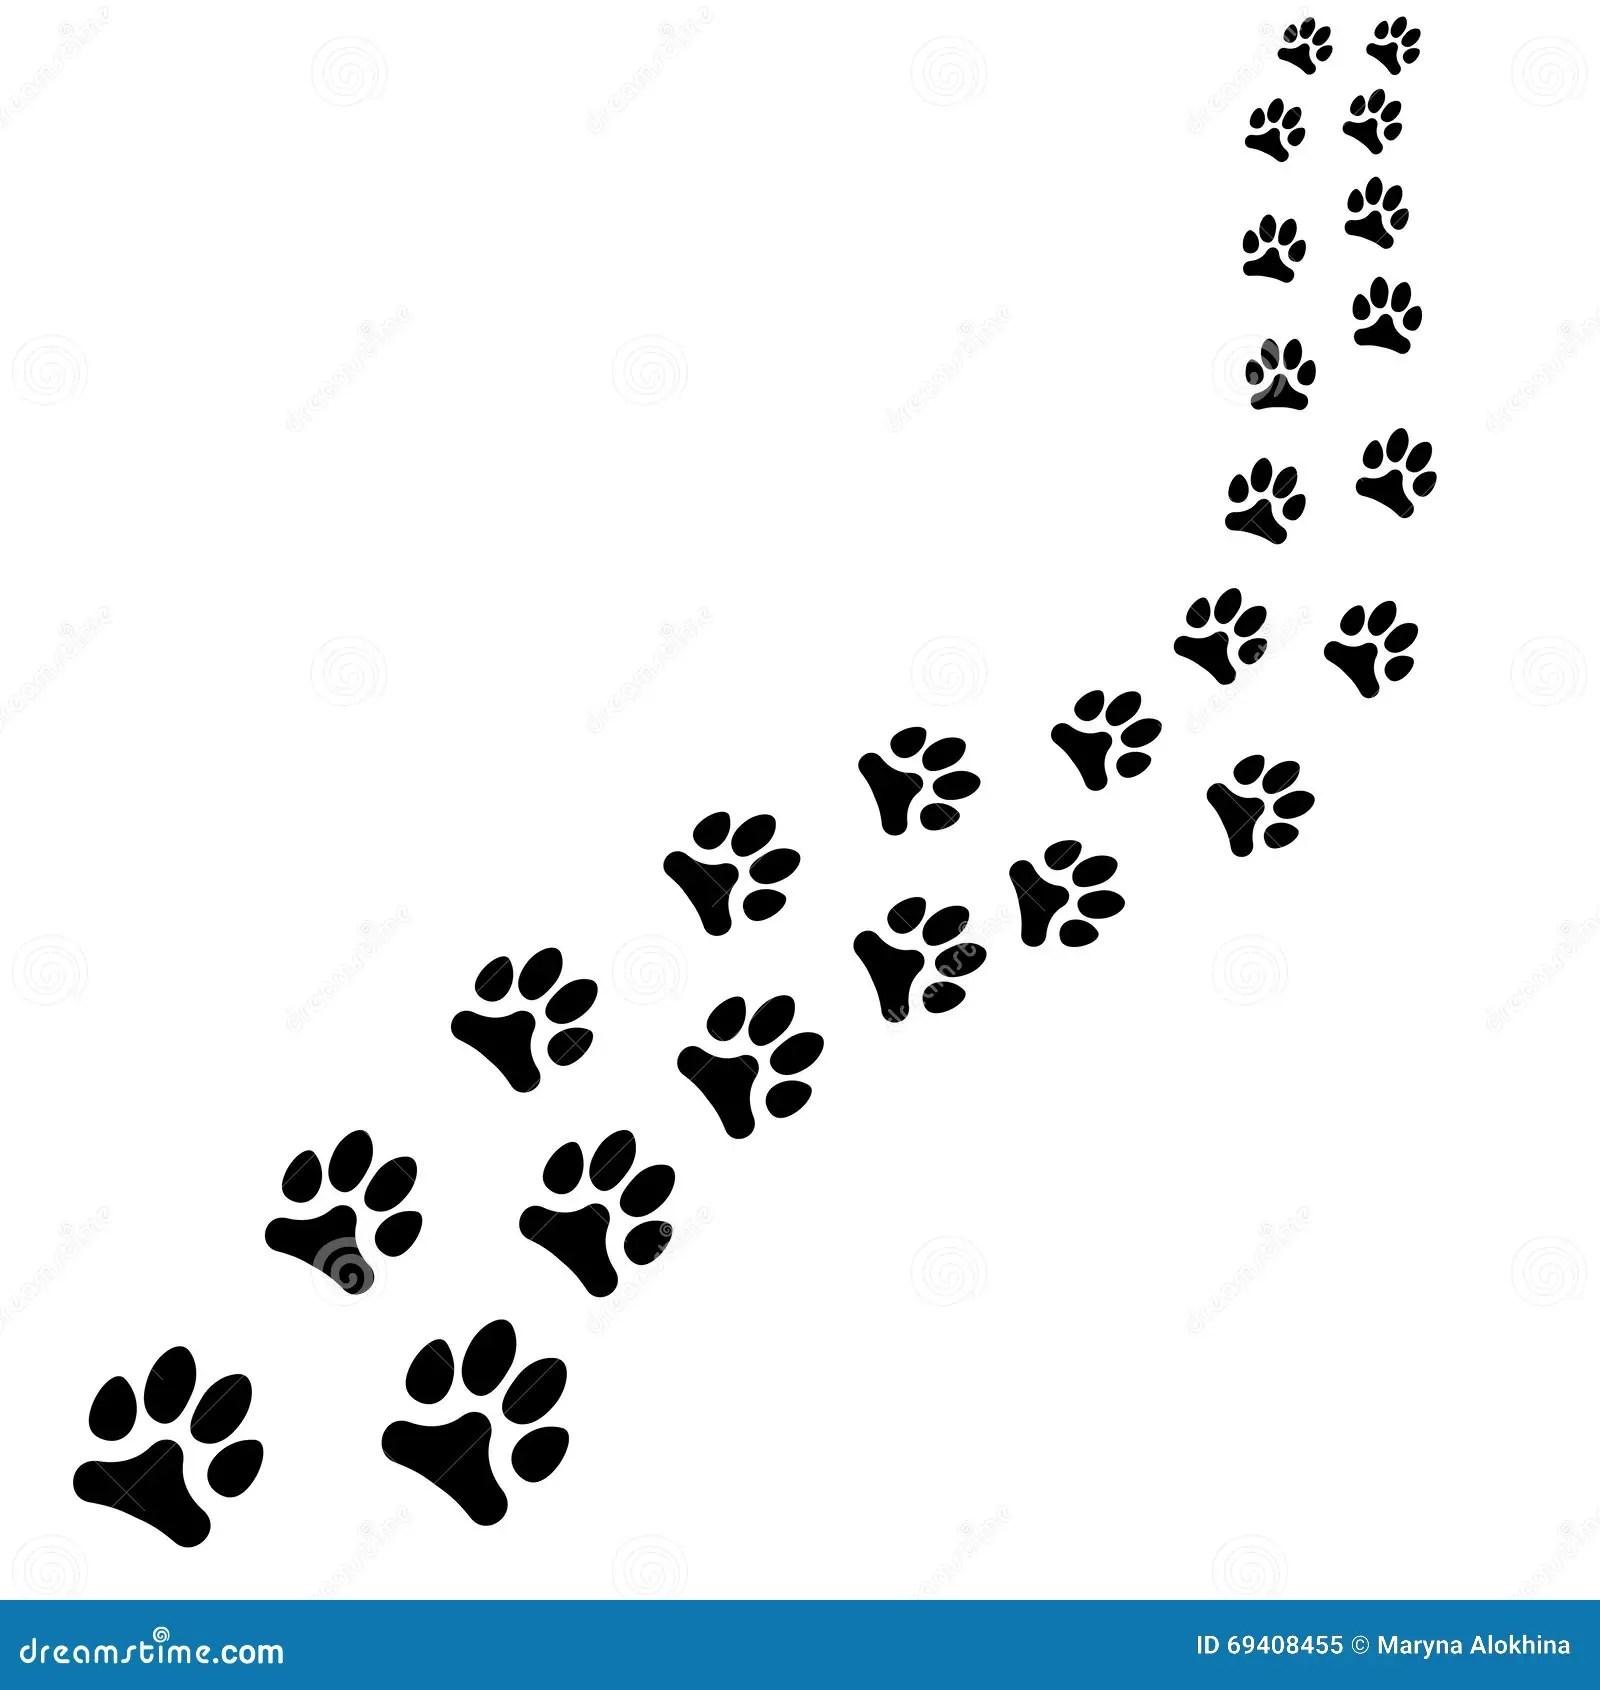 Footprints Illustration Isolated On White Royalty Free Cartoon